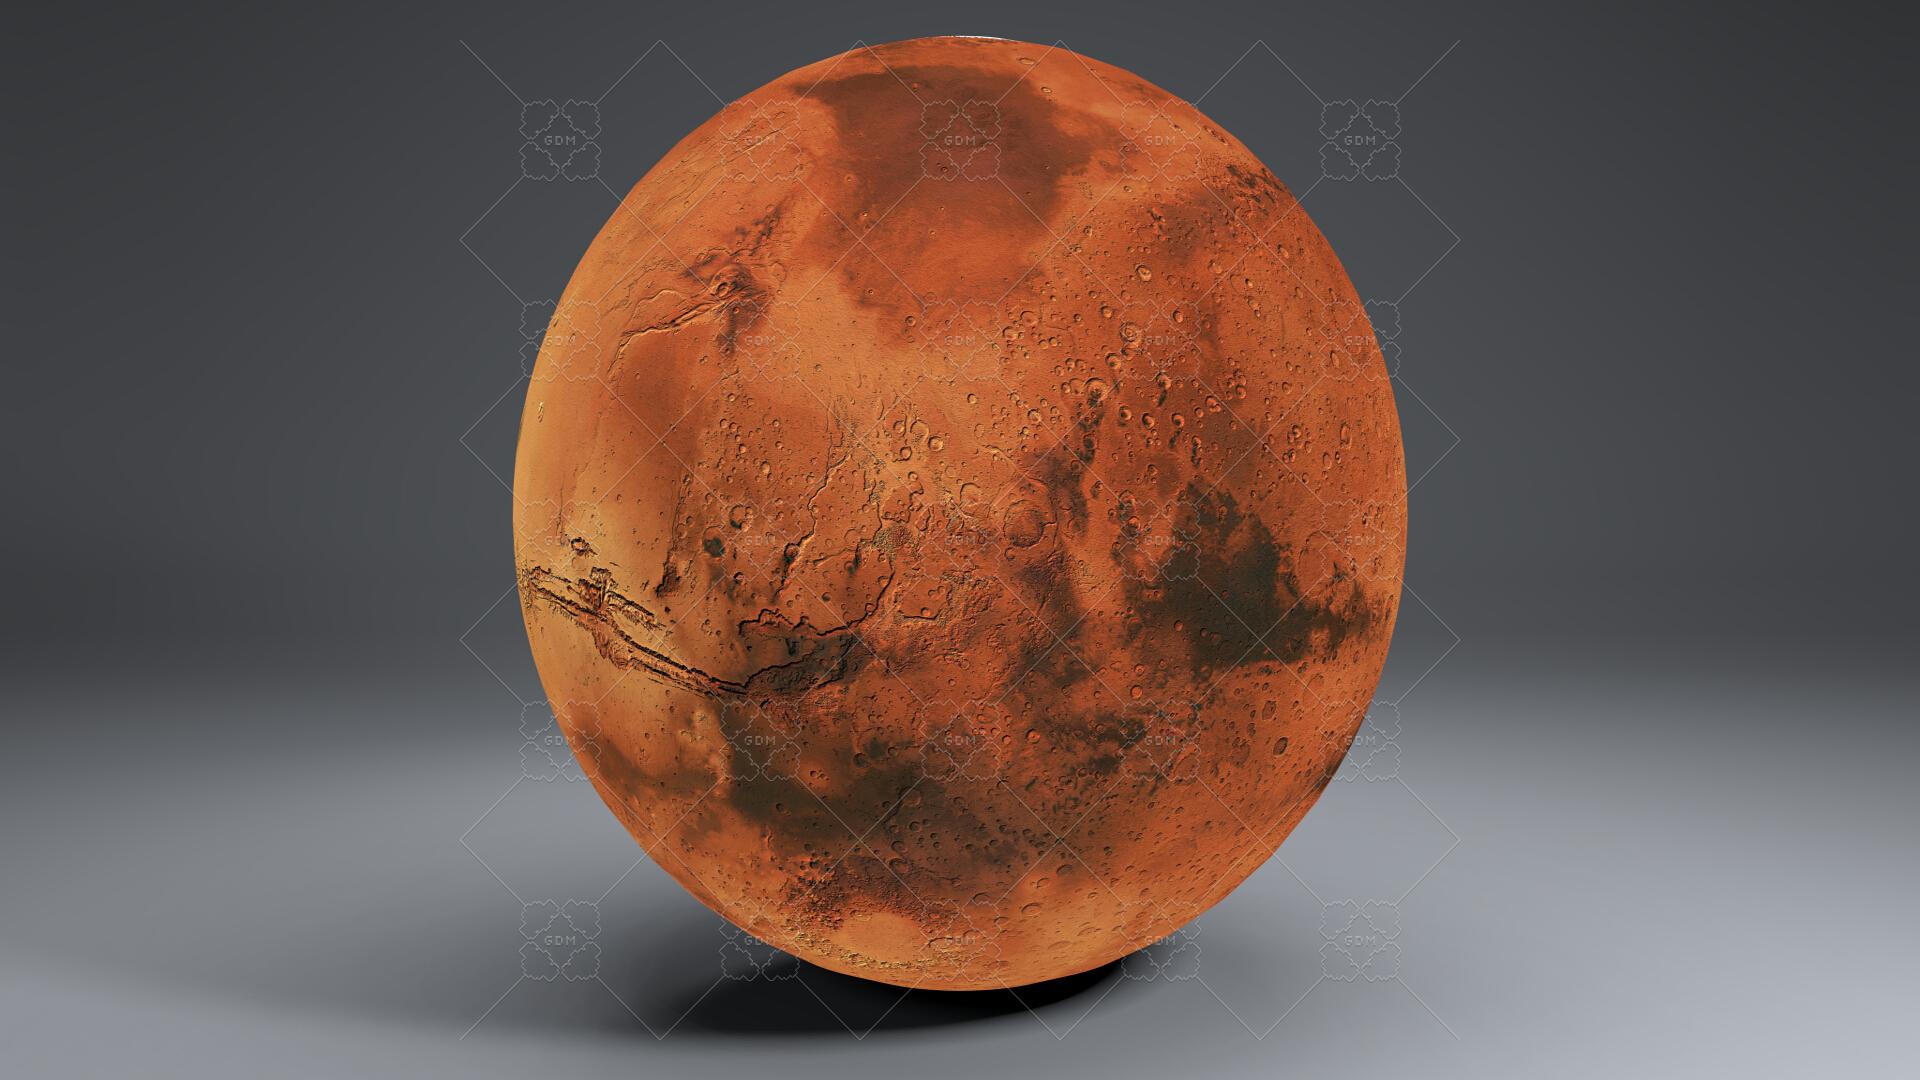 Vaisala and FMI Technology Heads to Mars Onboard NASAs